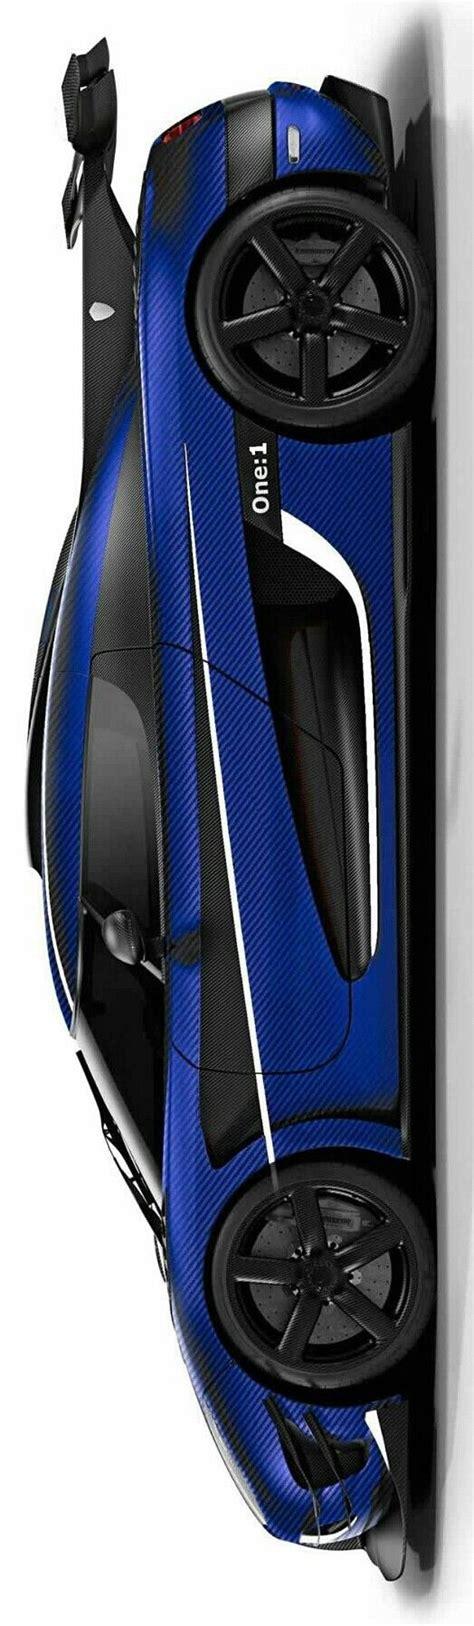 koenigsegg dallas 1000 ideas about bmw sports car on pinterest bmw sport